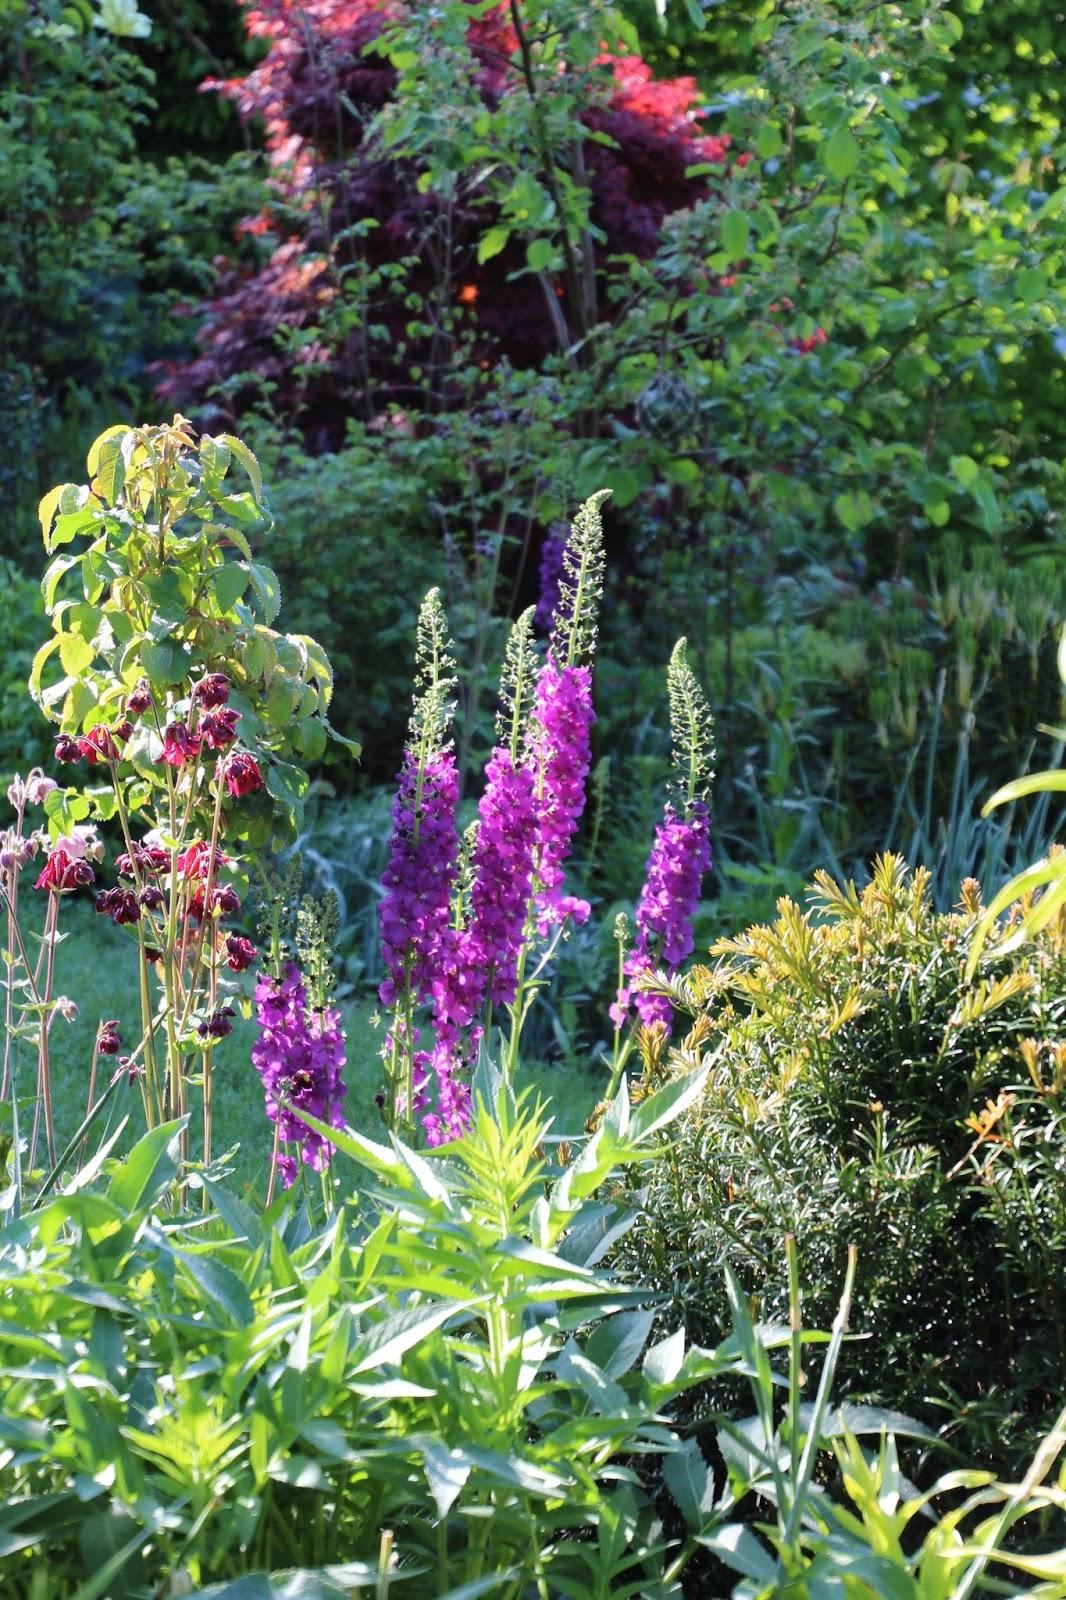 Violkungsljus Verbascum phoeniceum 'Violetta